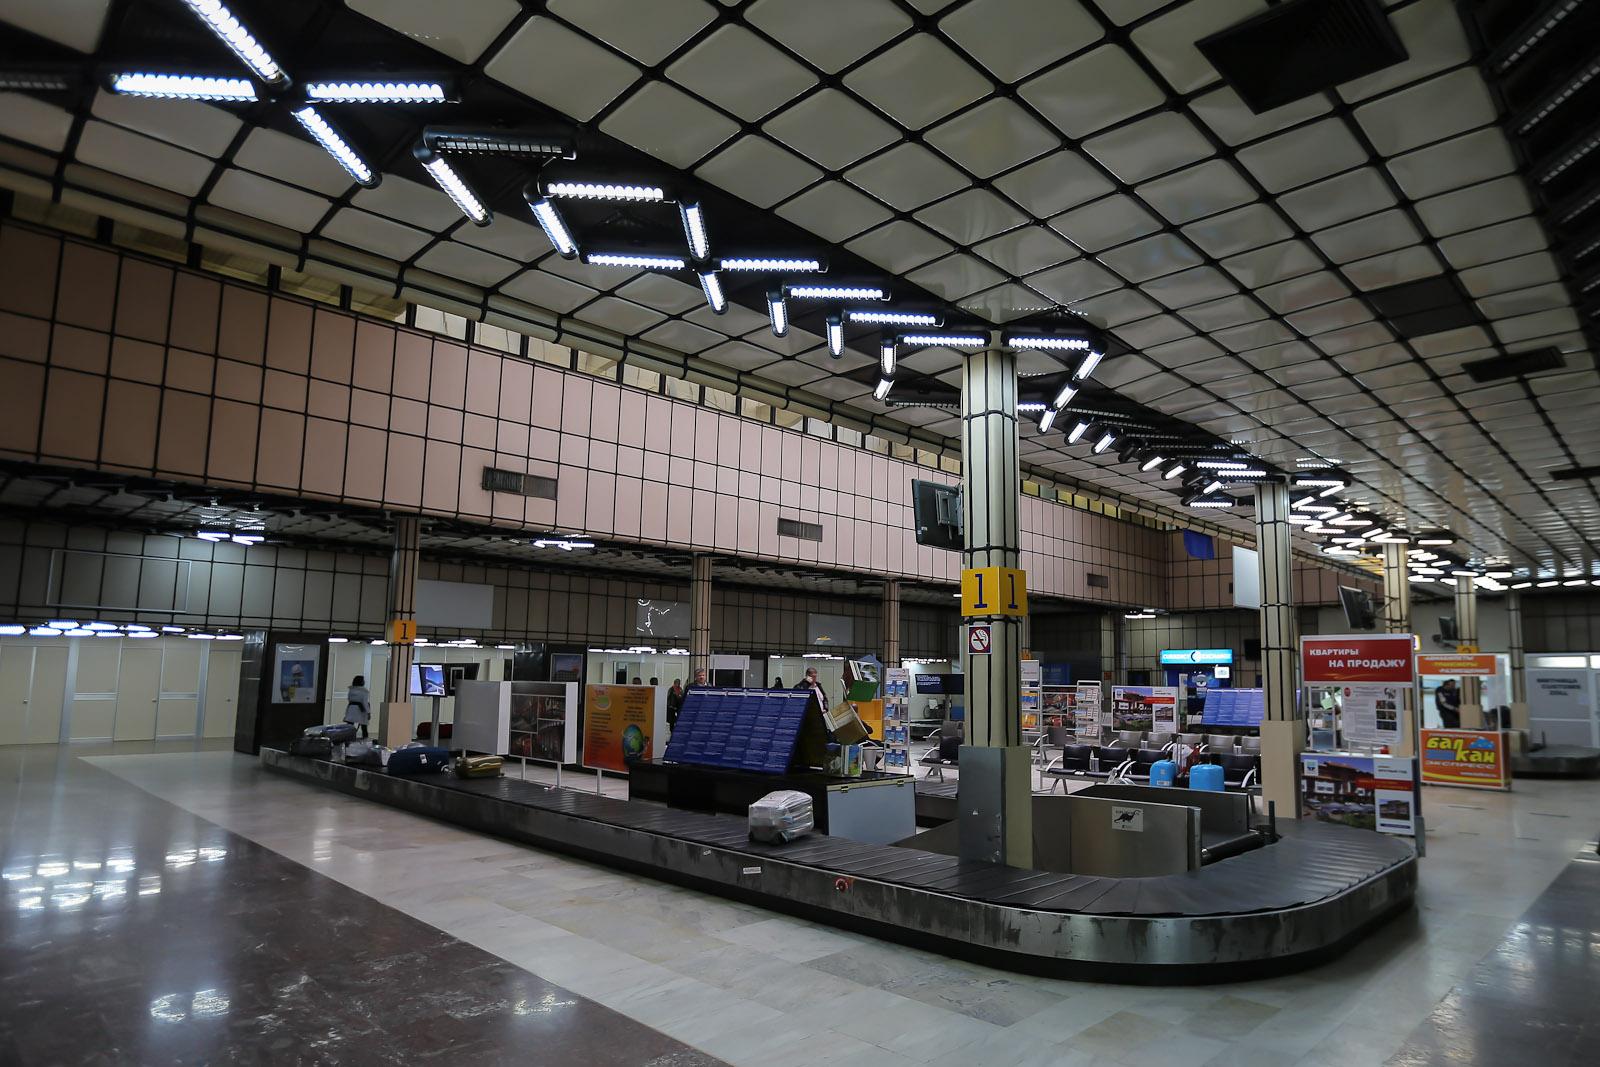 Зал выдачи багажа в старом терминале аэропорта Бургаса